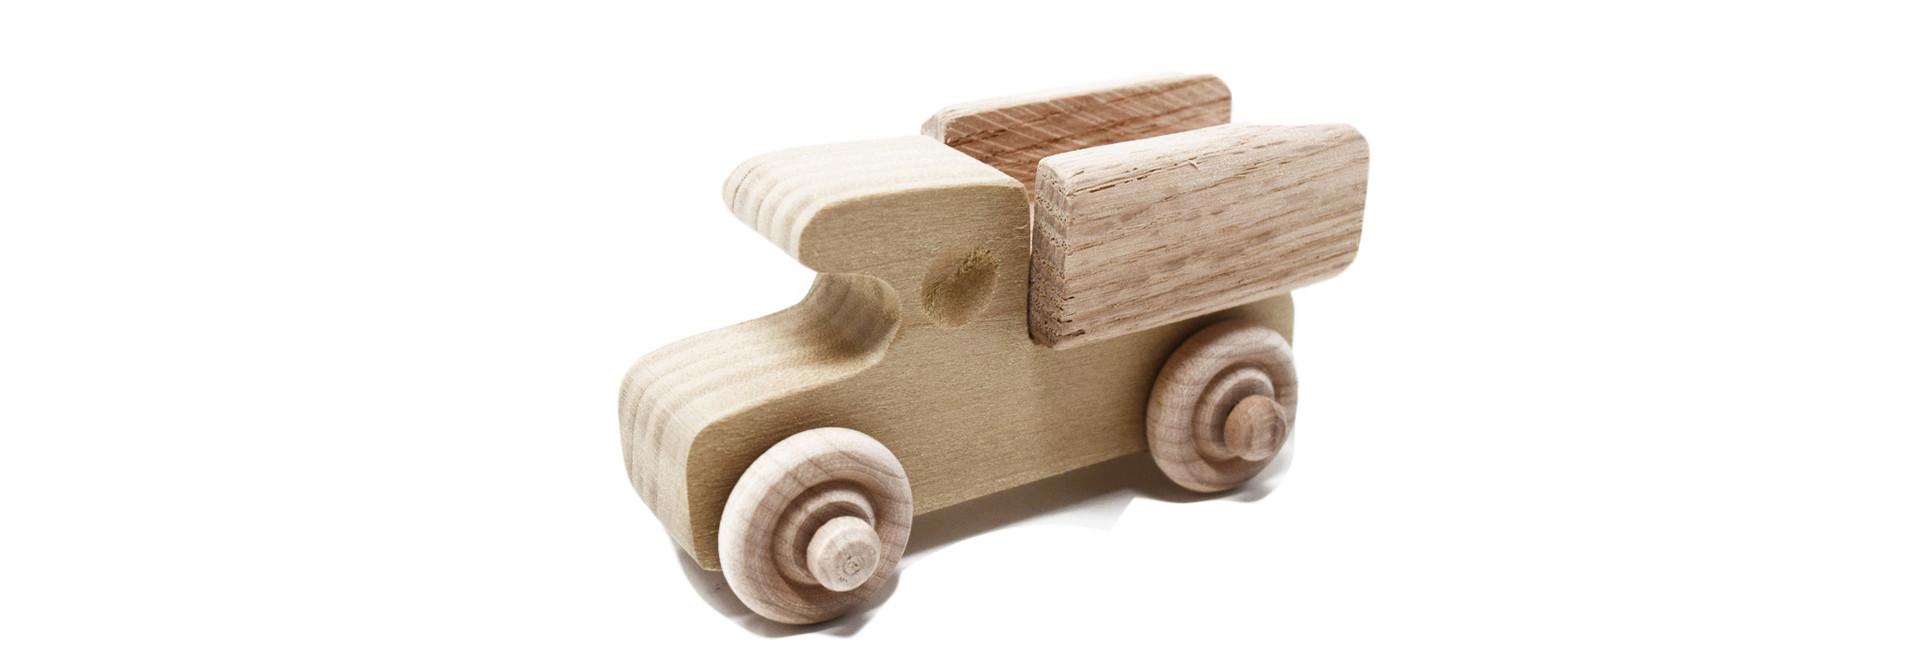 Mini Wooden Pickup Wheel Toy